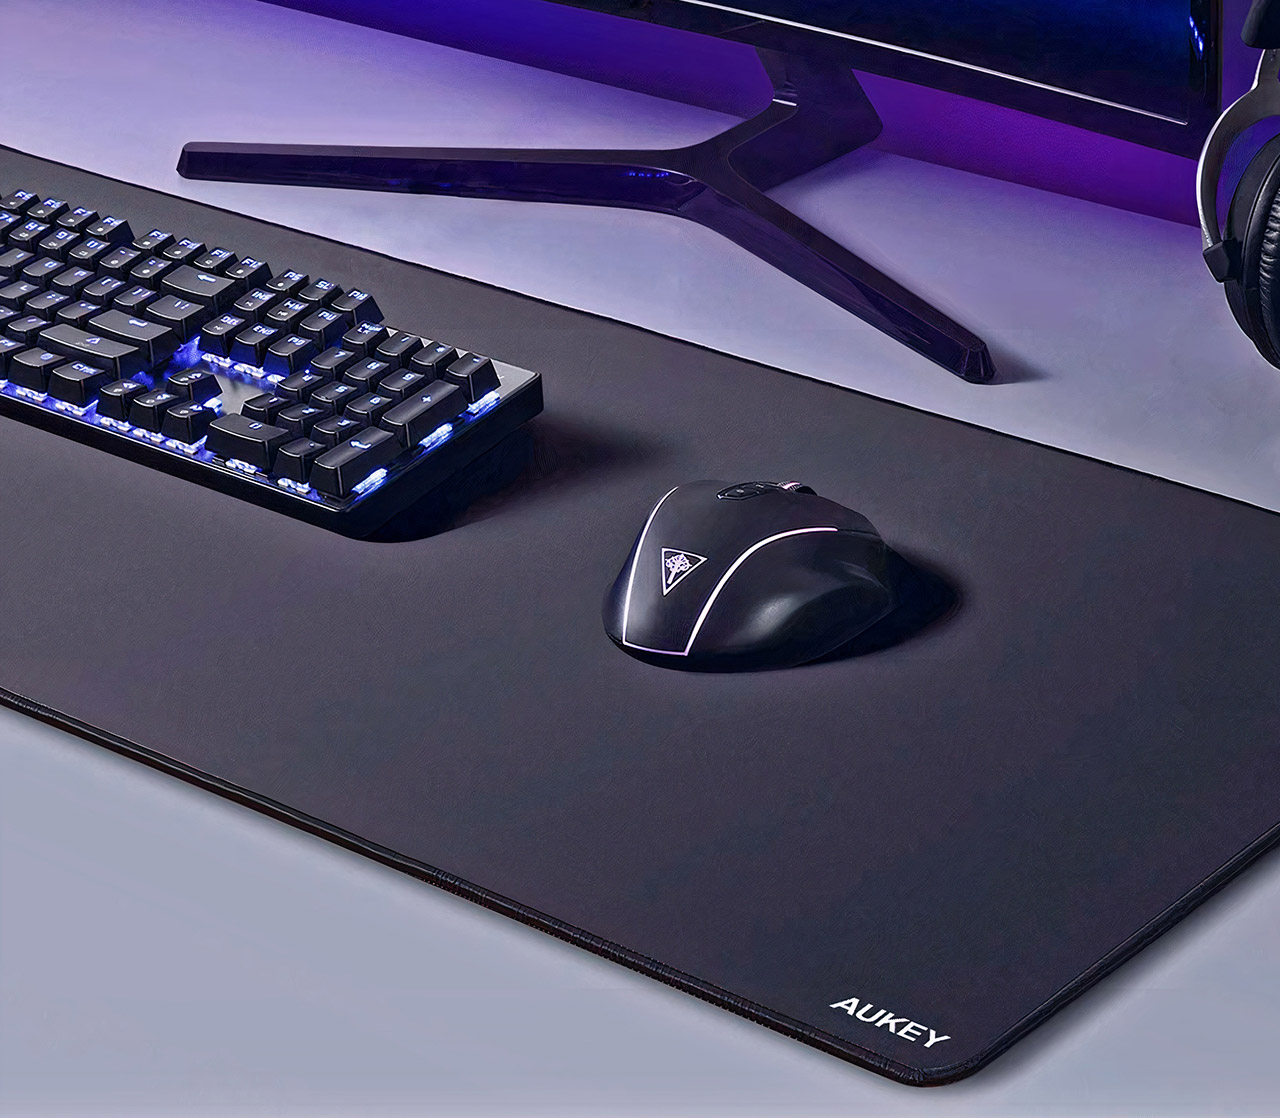 AUKEY XXL Gaming Mouse Pad KM-P3